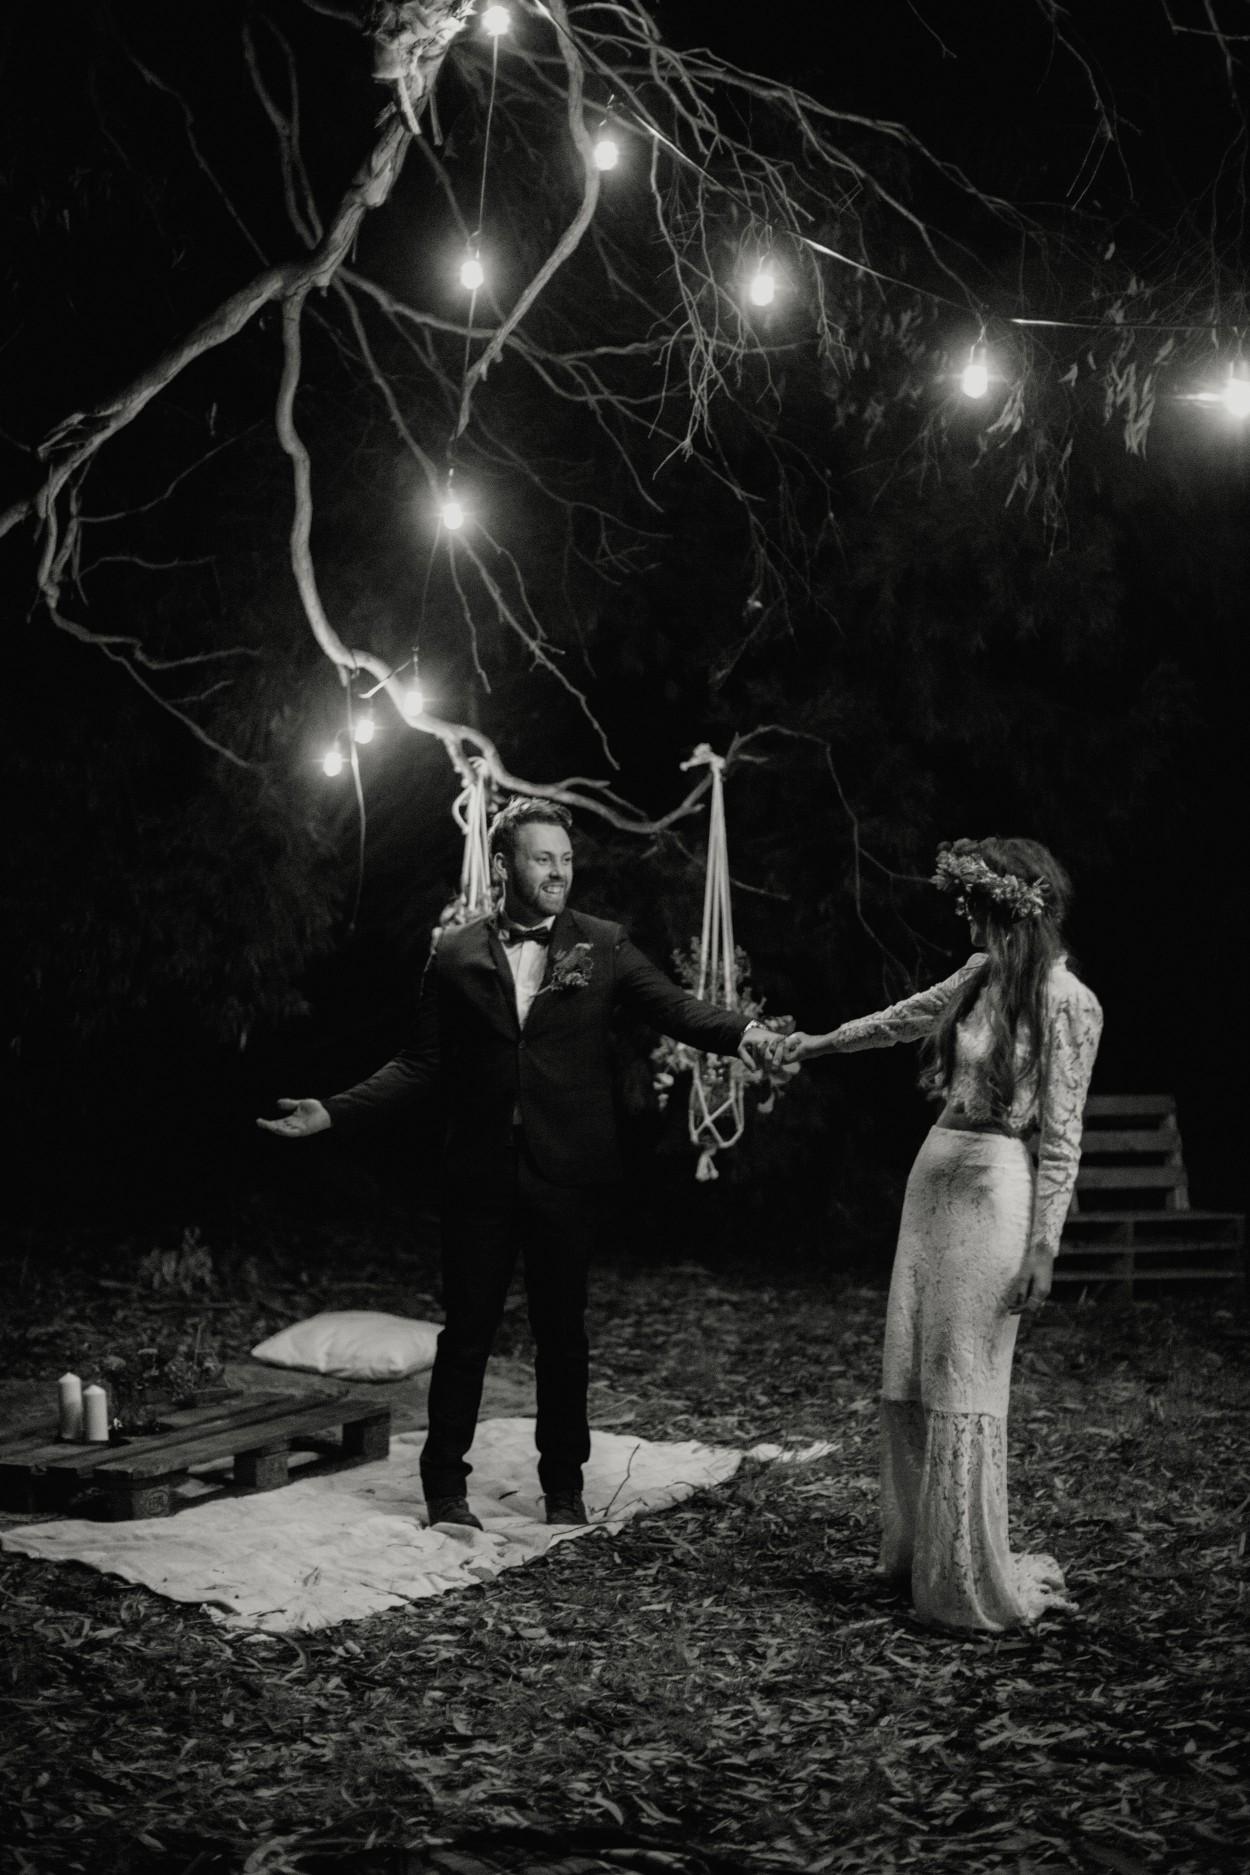 I-Got-You-Babe-&-Co.-Wedding-Photographers-Cassie010.jpg